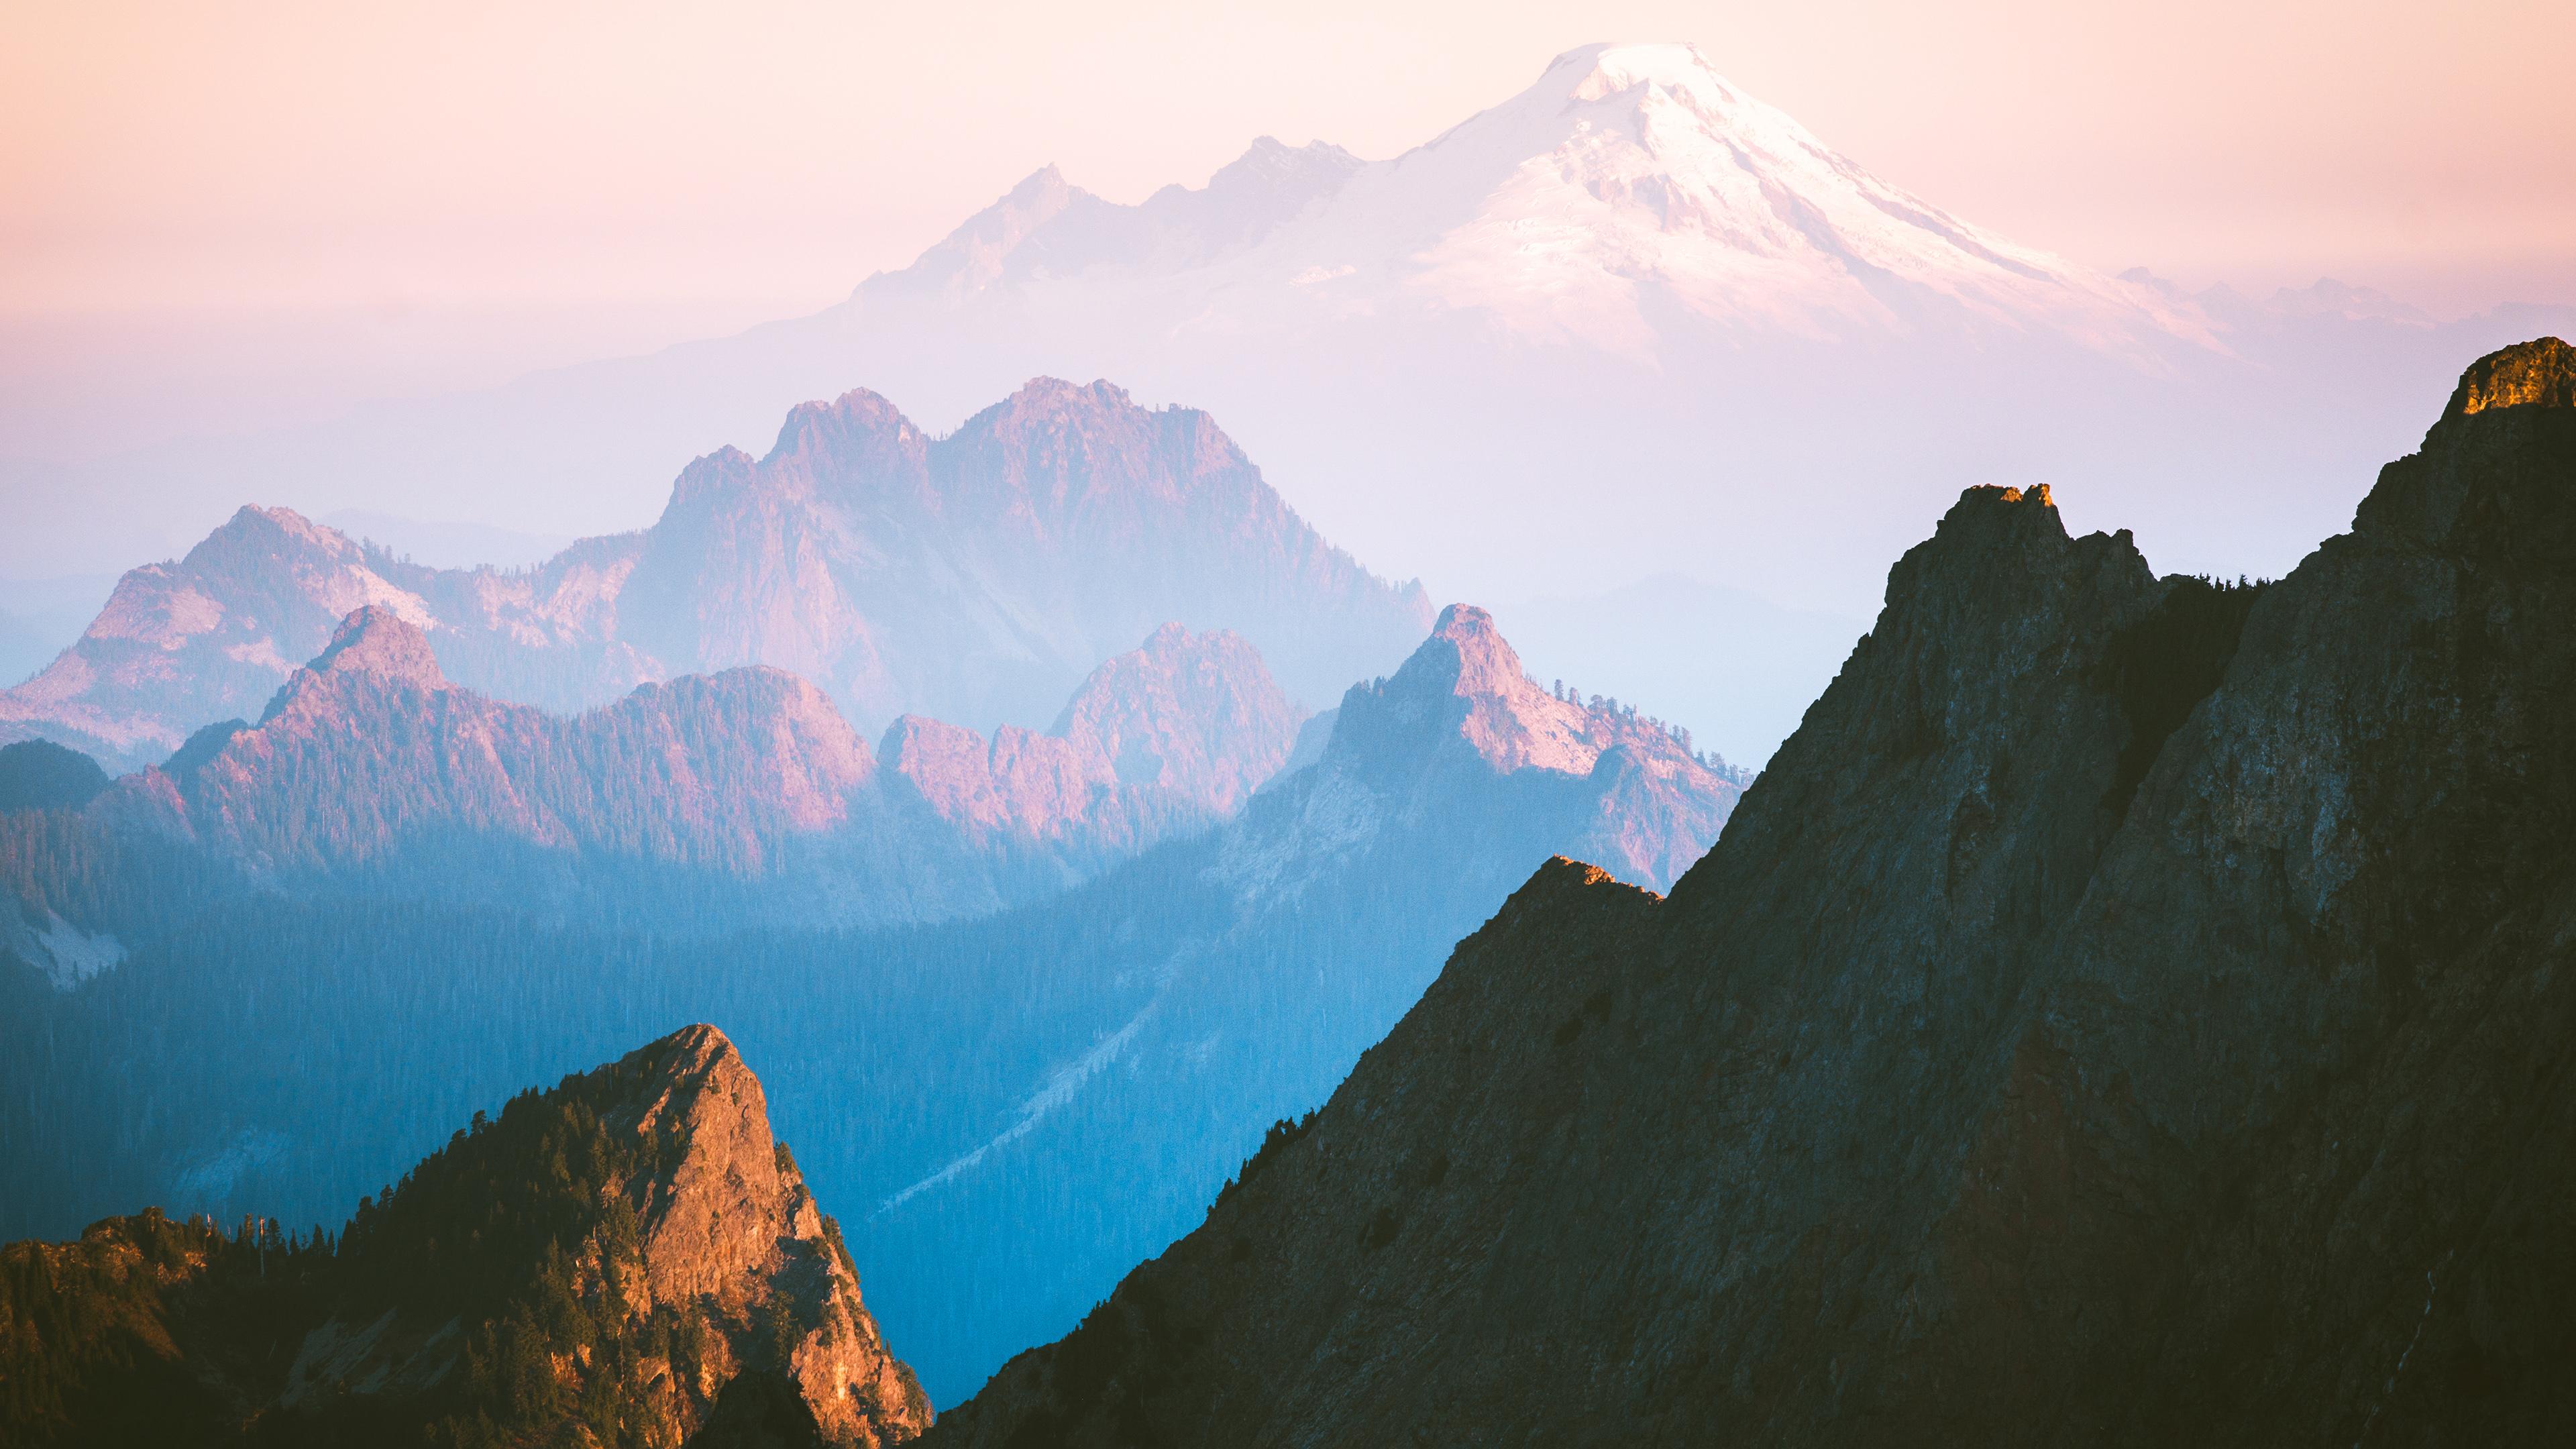 Mountain 4k Ultra Hd Wallpaper Background Image